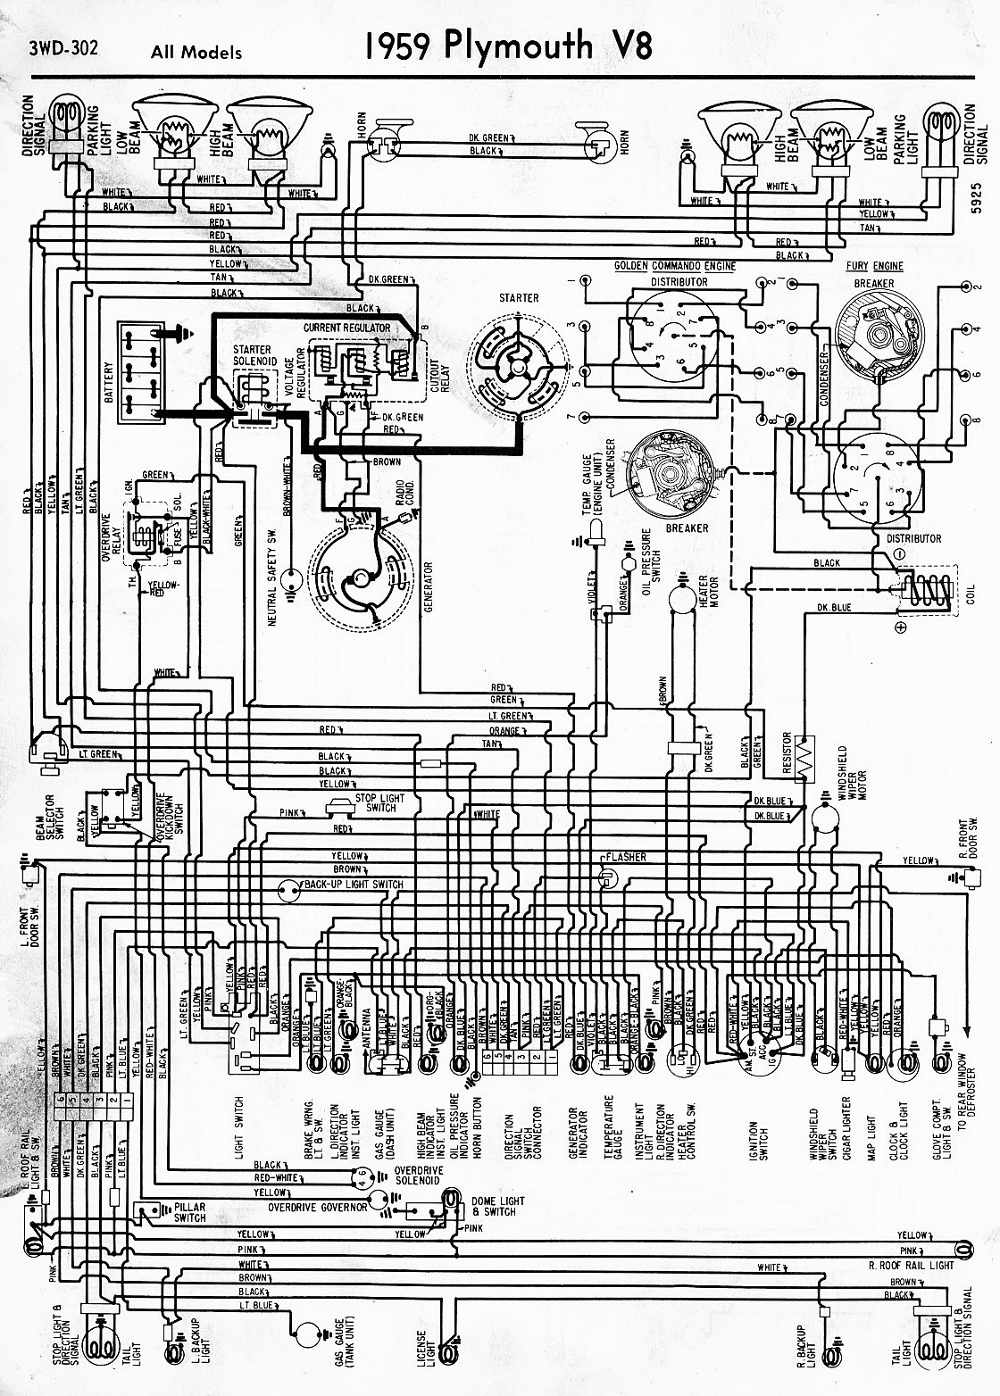 plymouth car manuals wiring diagrams pdf fault codes rh automotive manuals net